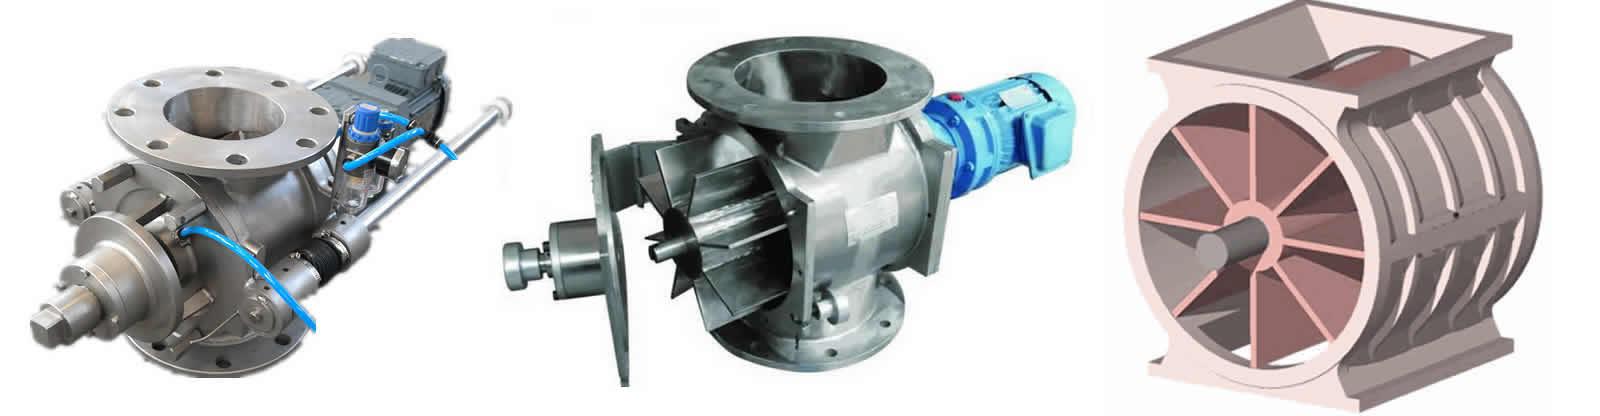 unloading valve 4